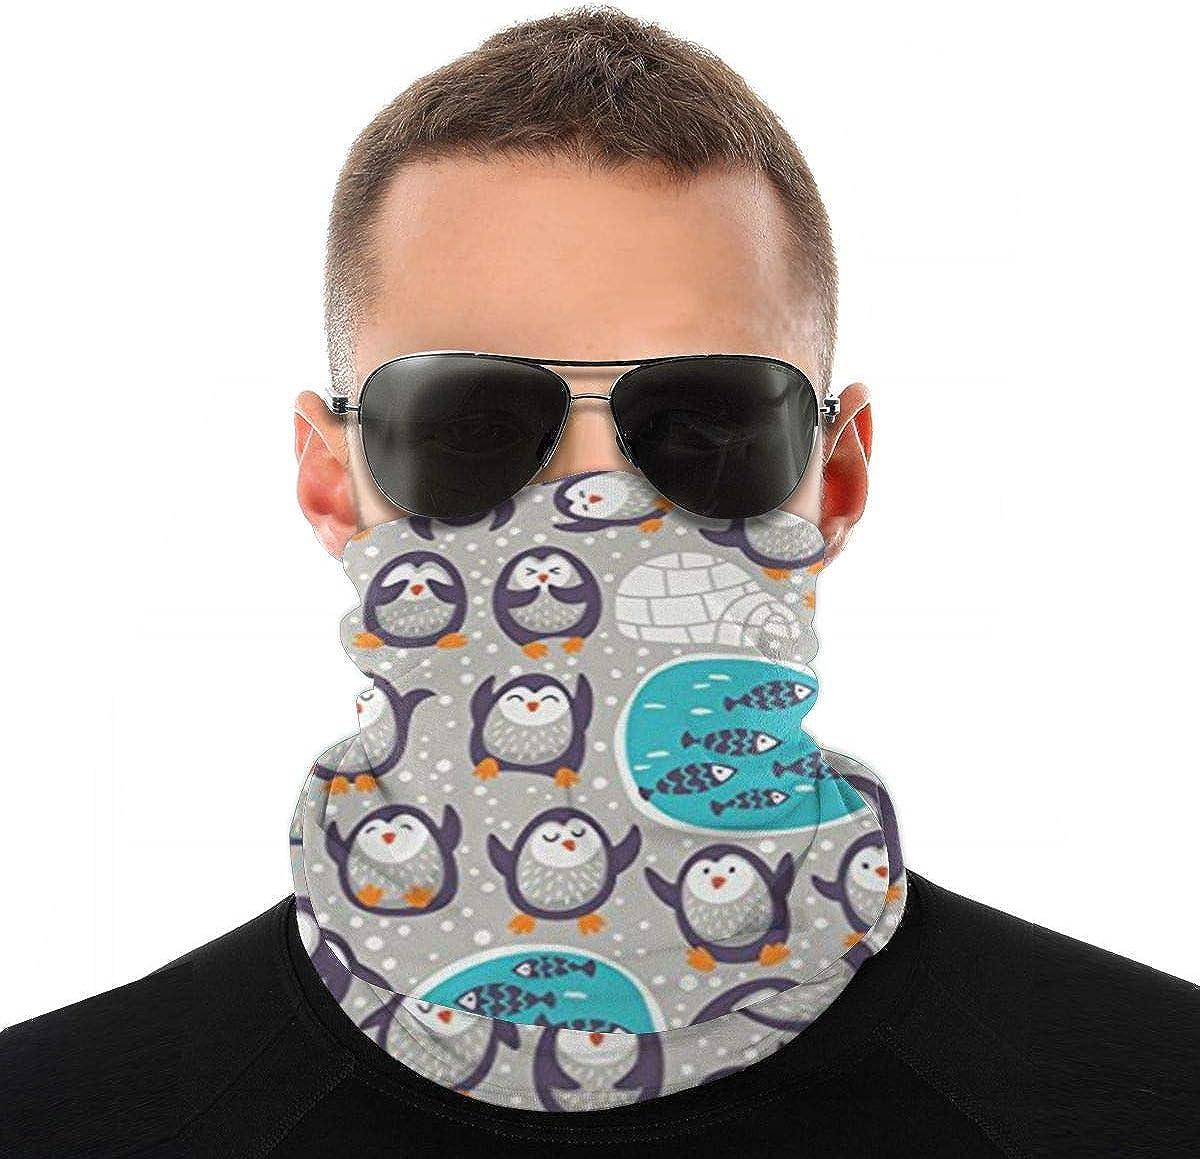 BDGAjdka Snow Funny Penguins Unisex Bandana Cuello Polaina Protección facial Bufanda Sol Protección UV Polvo A prueba de viento Sombrero para uso al aire libre